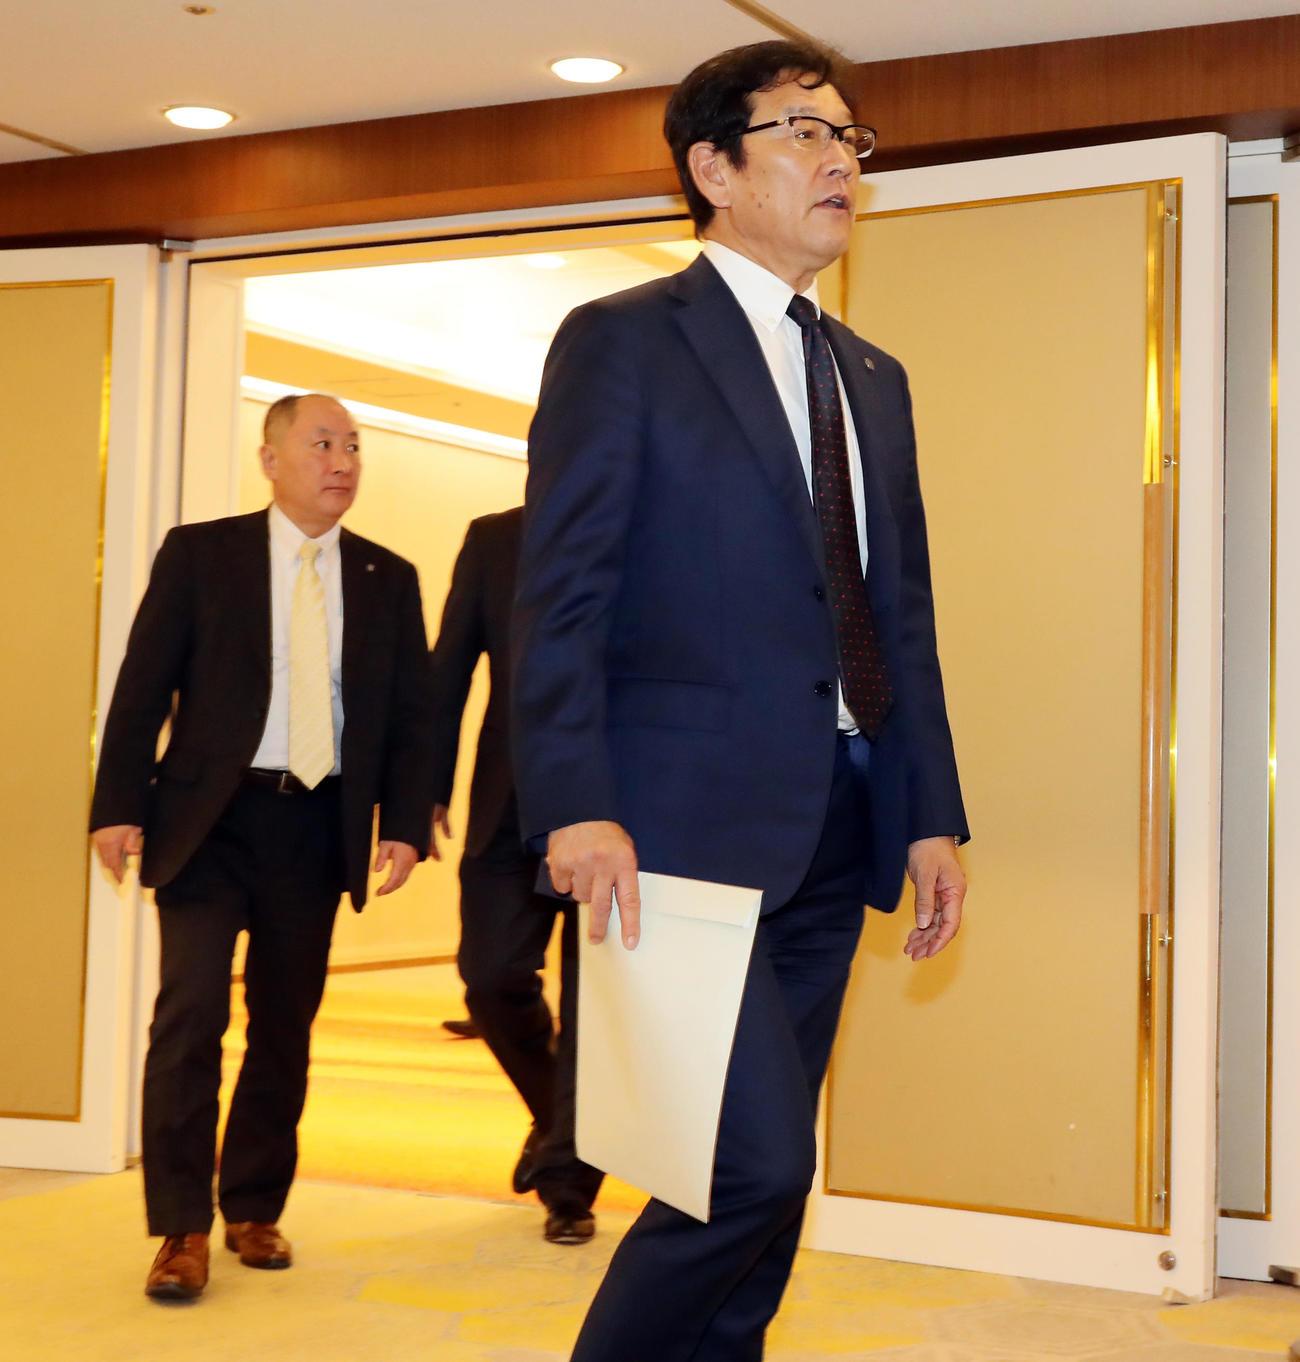 NPB12球団監督会議を終え、会場を出る日本ハム栗山監督(撮影・浅見桂子)